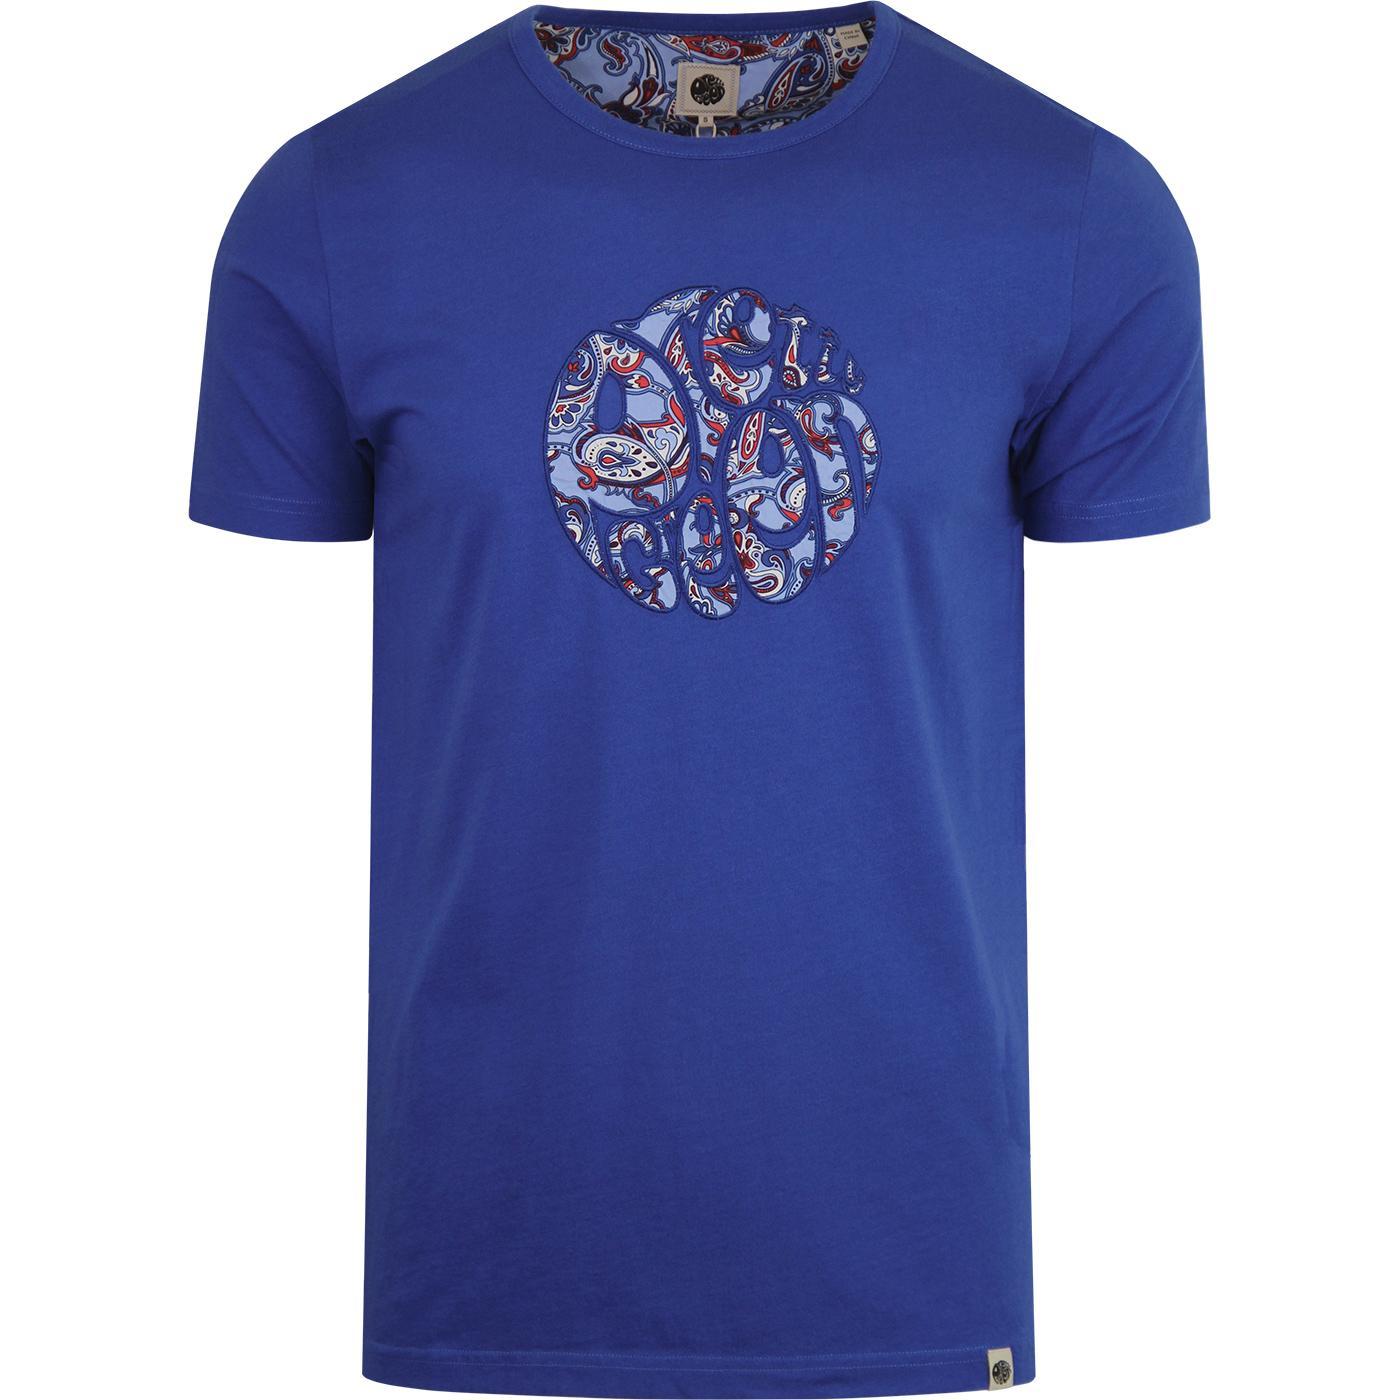 PRETTY GREEN 60s Mod Paisley Applique T-shirt BLUE